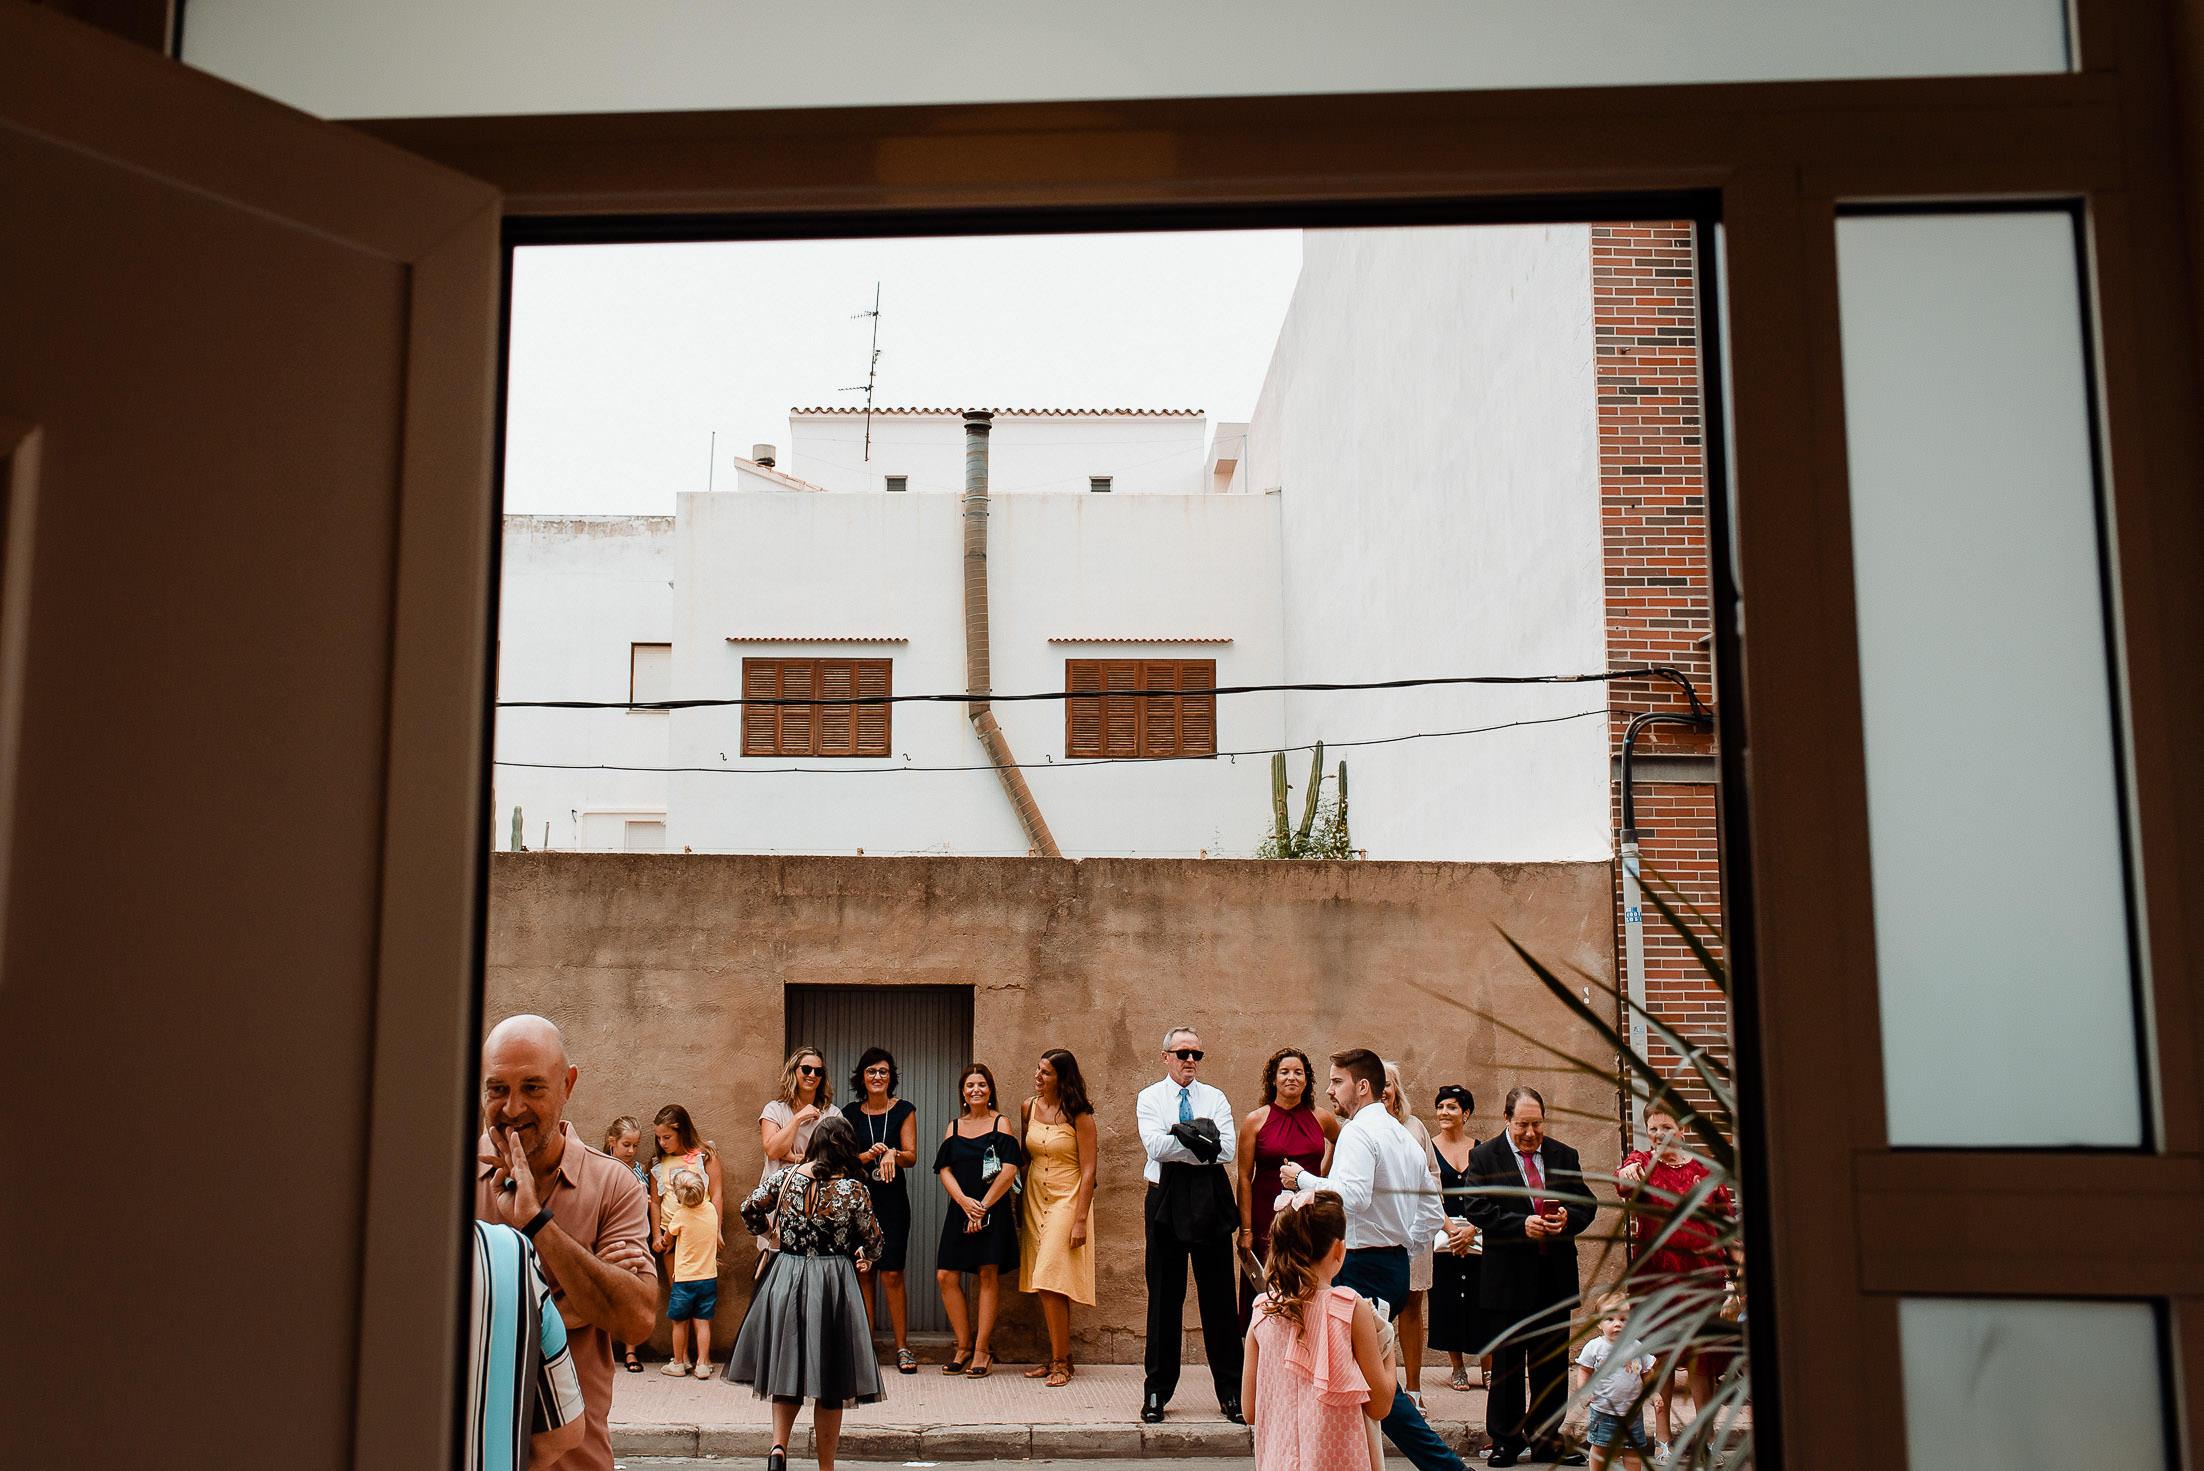 Boda-Gandia-España-fotografo-documental-matrimonio-deborah-dantzoff-fotografia-internacional-destination-wedding-photographer-europe